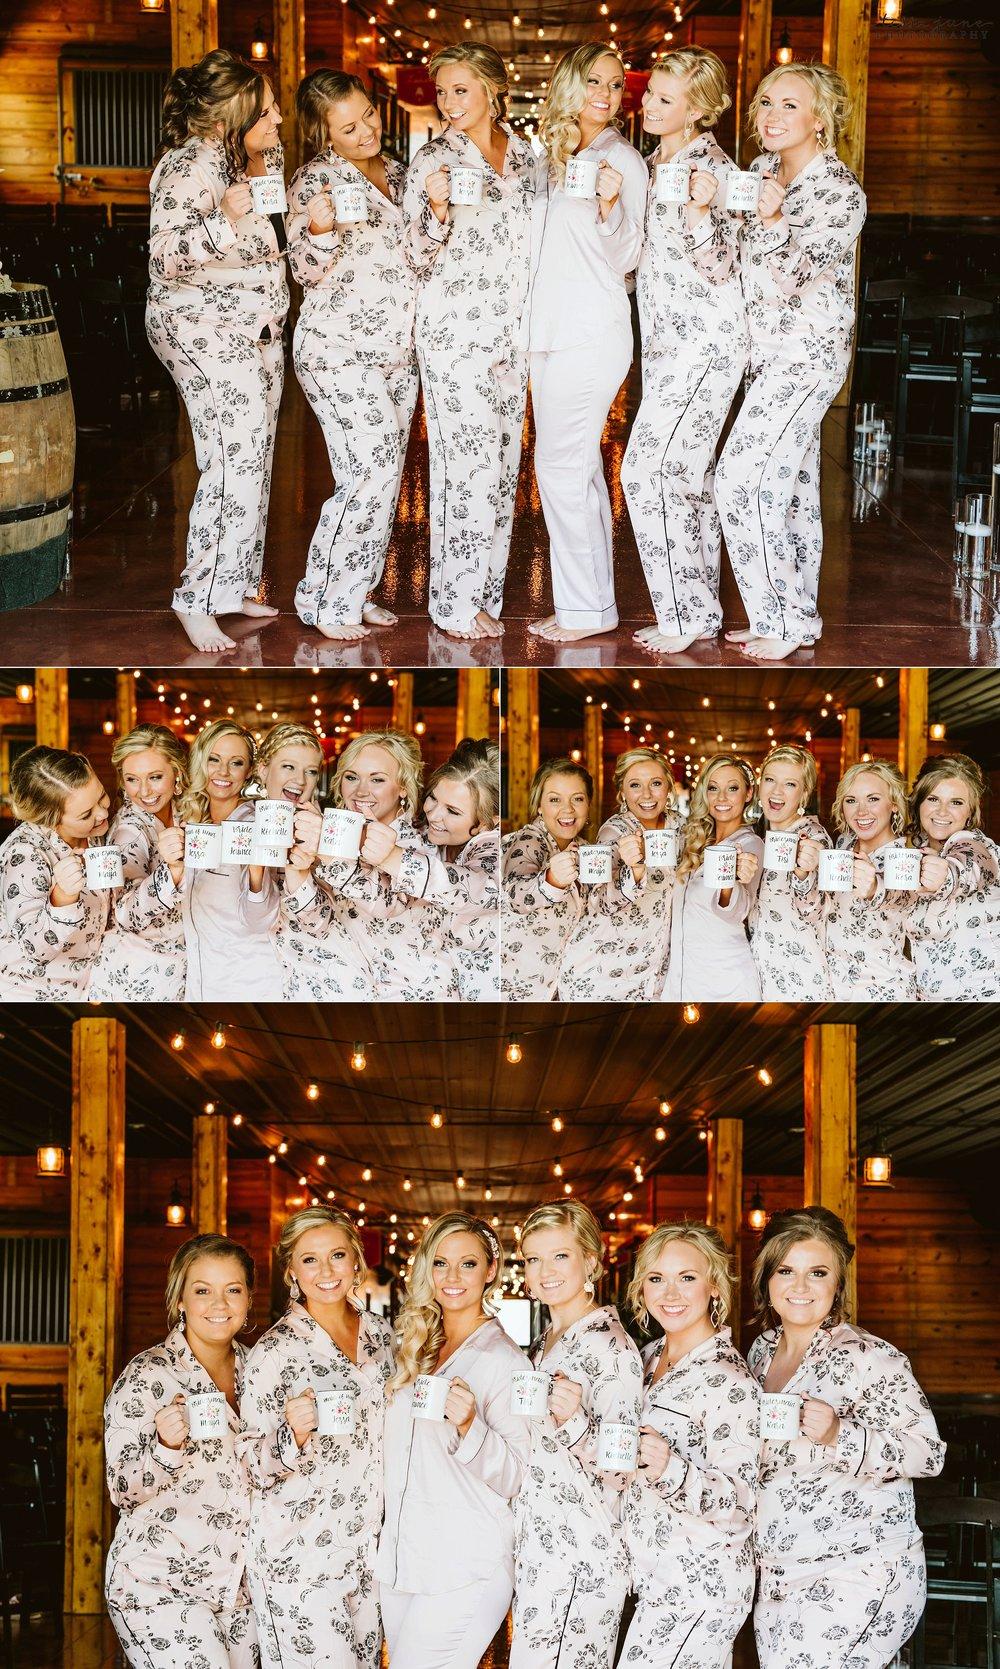 carlos-creek-winery-wedding-alexandria-minnesota-glam-elegant-floral-10.jpg